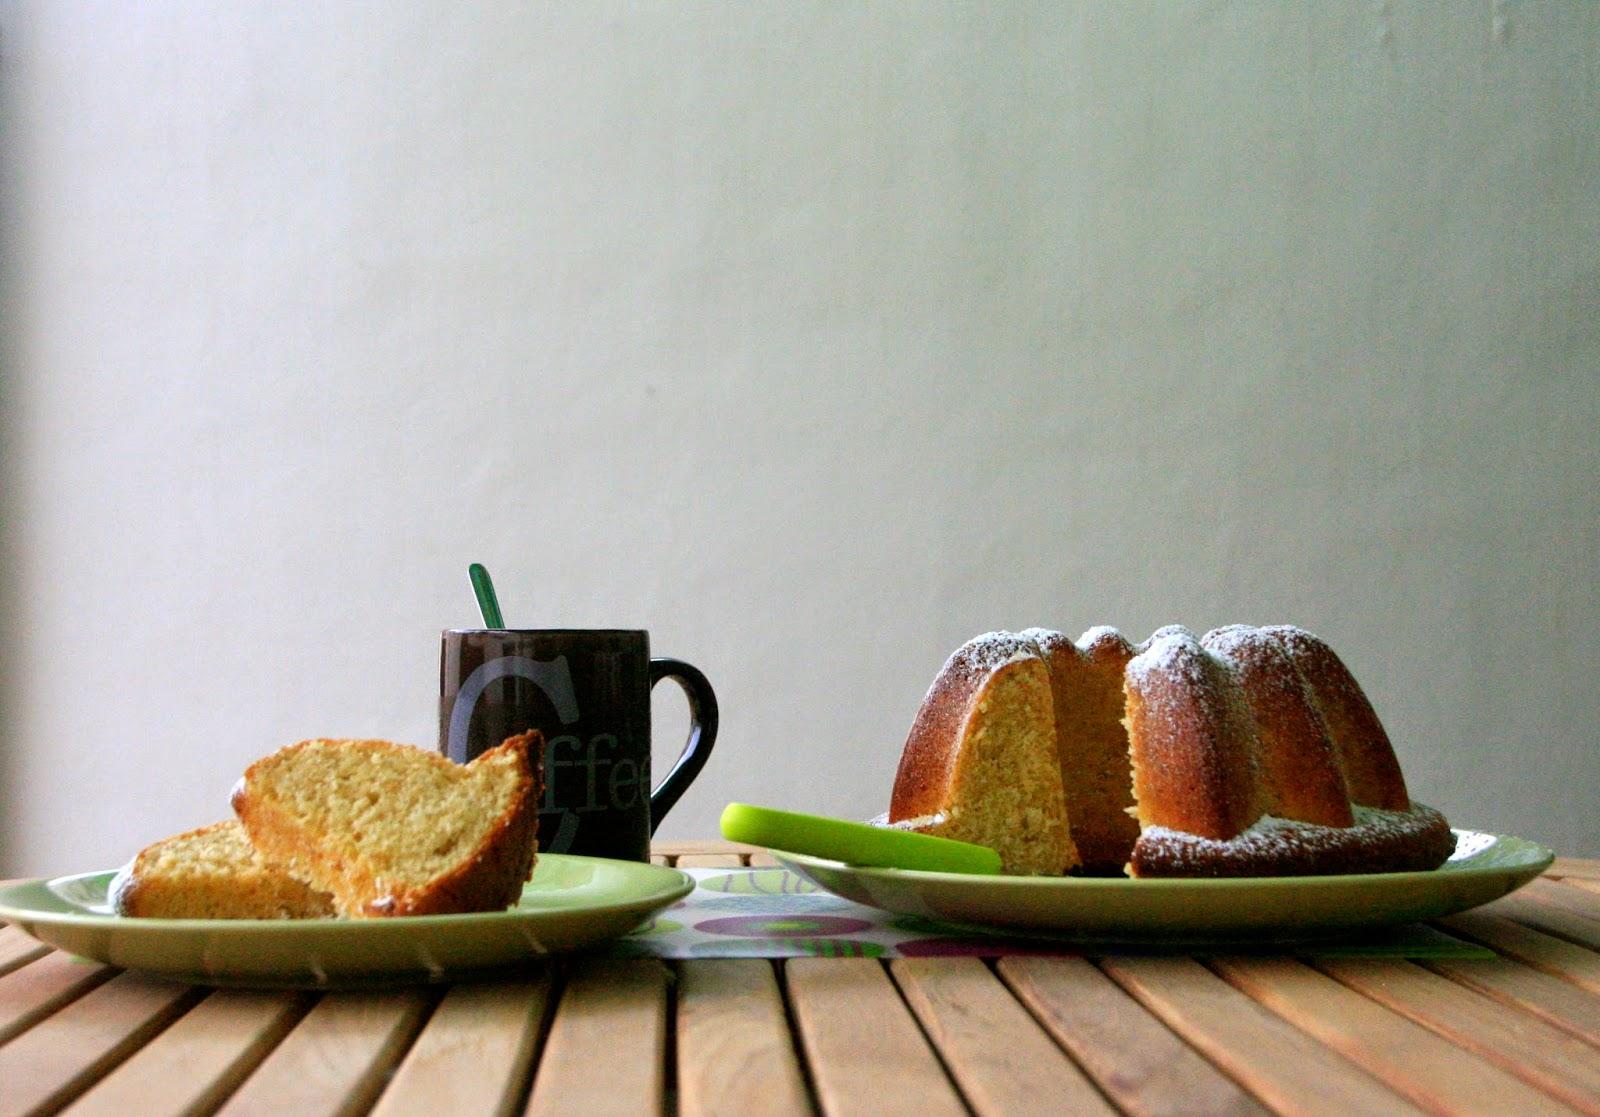 Recepta de bundt cake de nata per esmorzar